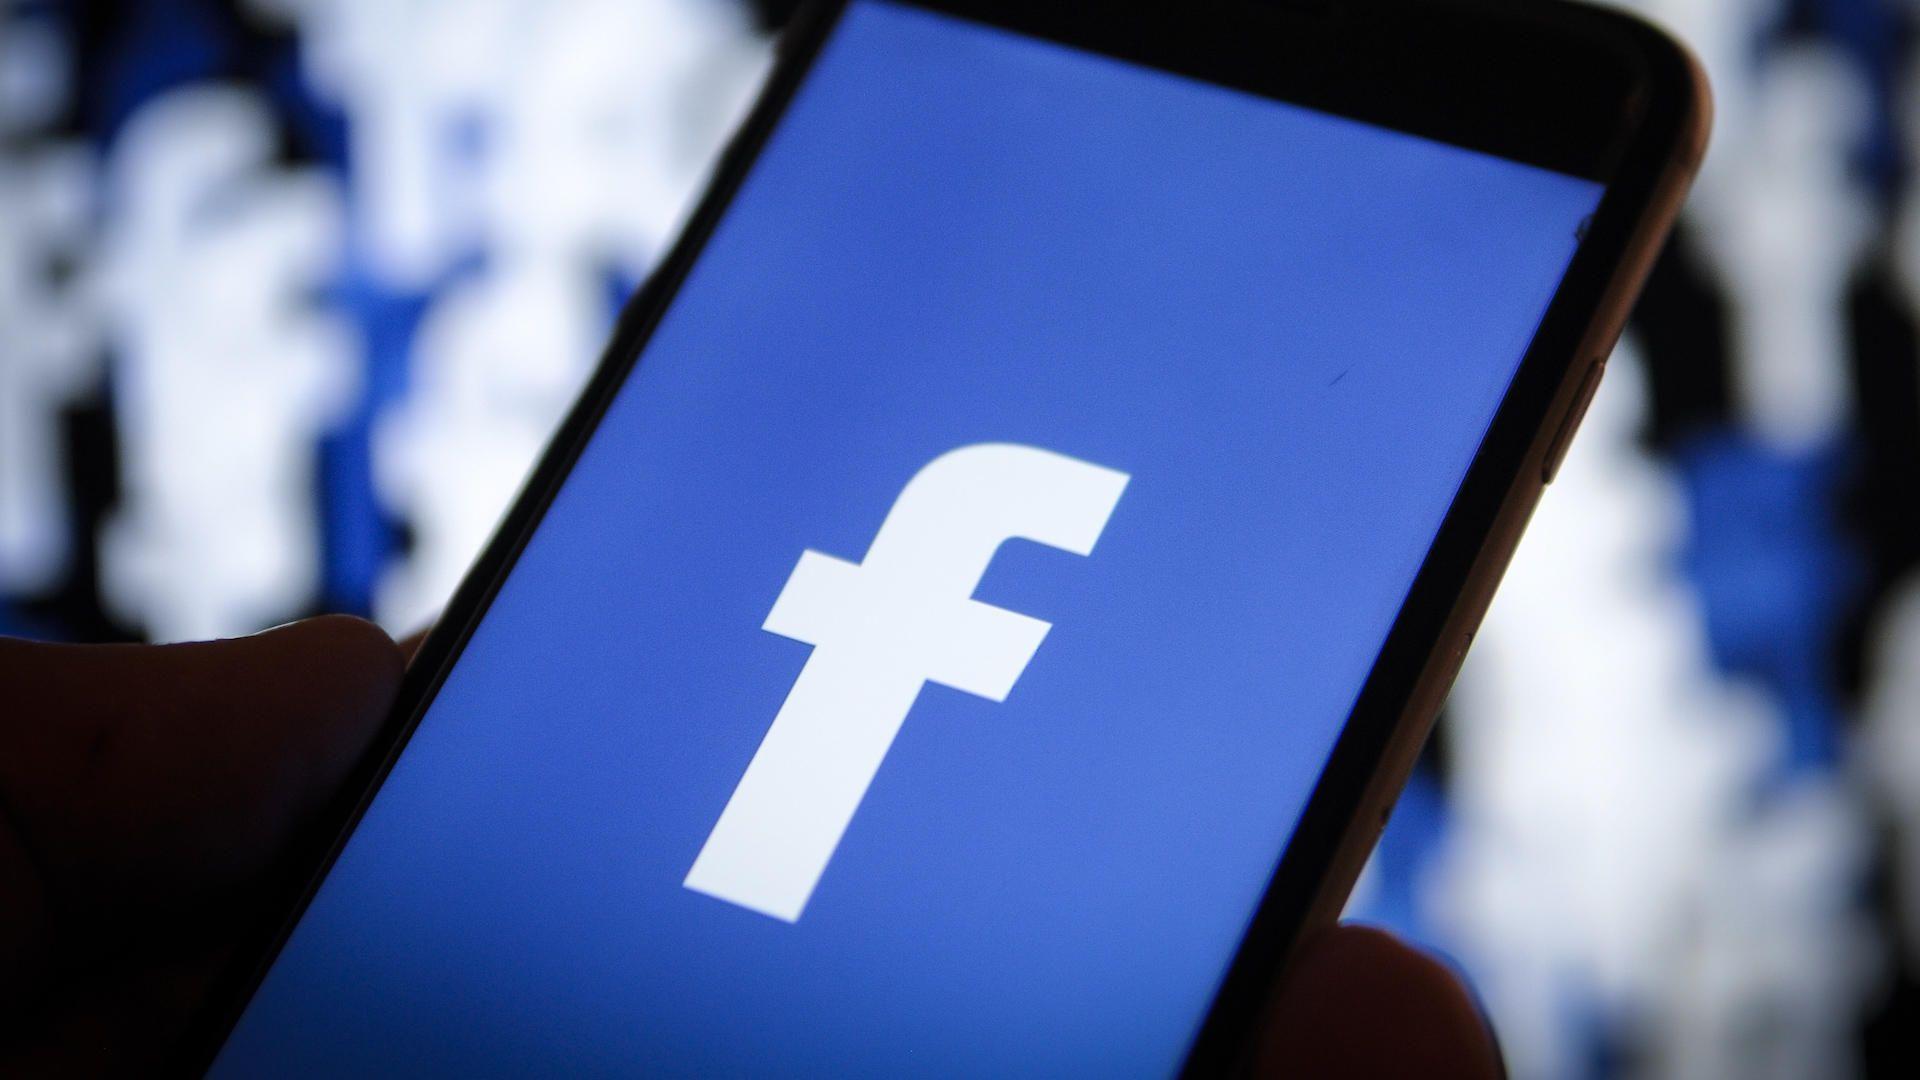 facebookக்கான பட முடிவுகள்